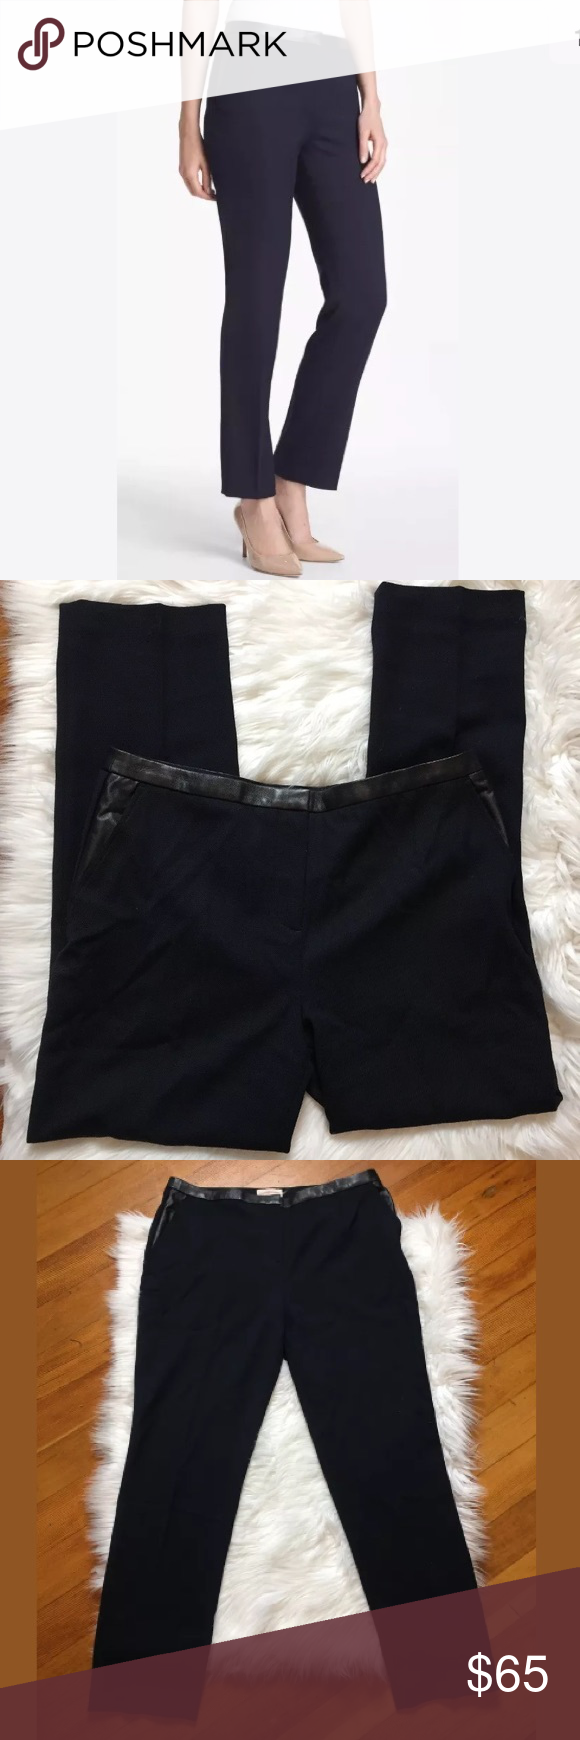 2e23e942b0b Tory Burch Christy wool leather trim ankle pants Pre owned Tory Burch  Christy wool blend ankle